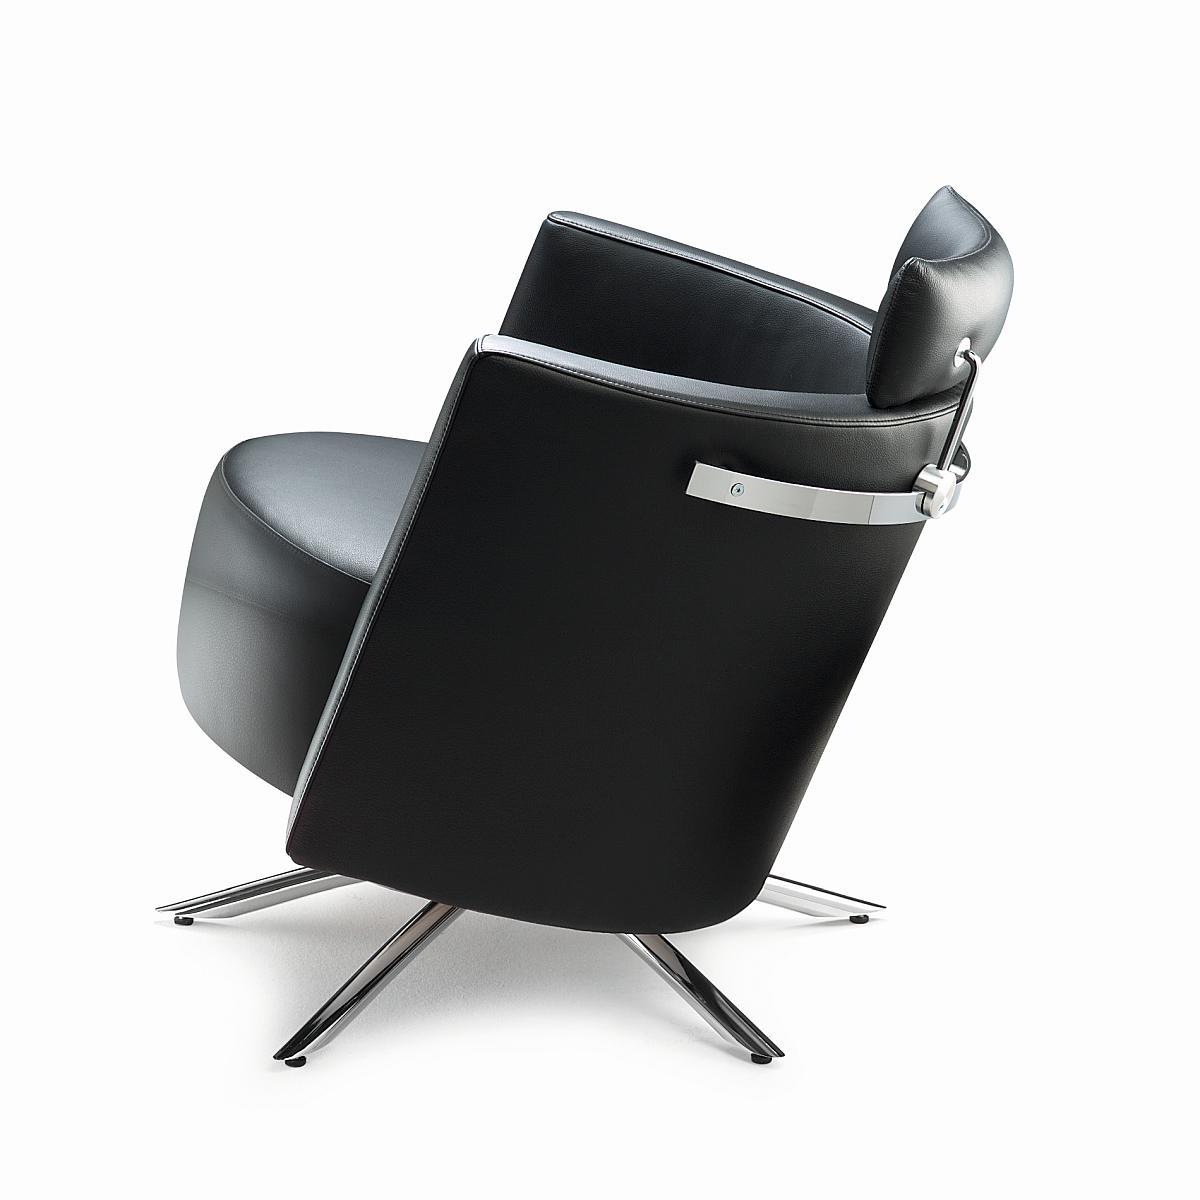 VITO Sessel in Leder COLORADO mit Kopfstütze und Reeling kann auch kippen